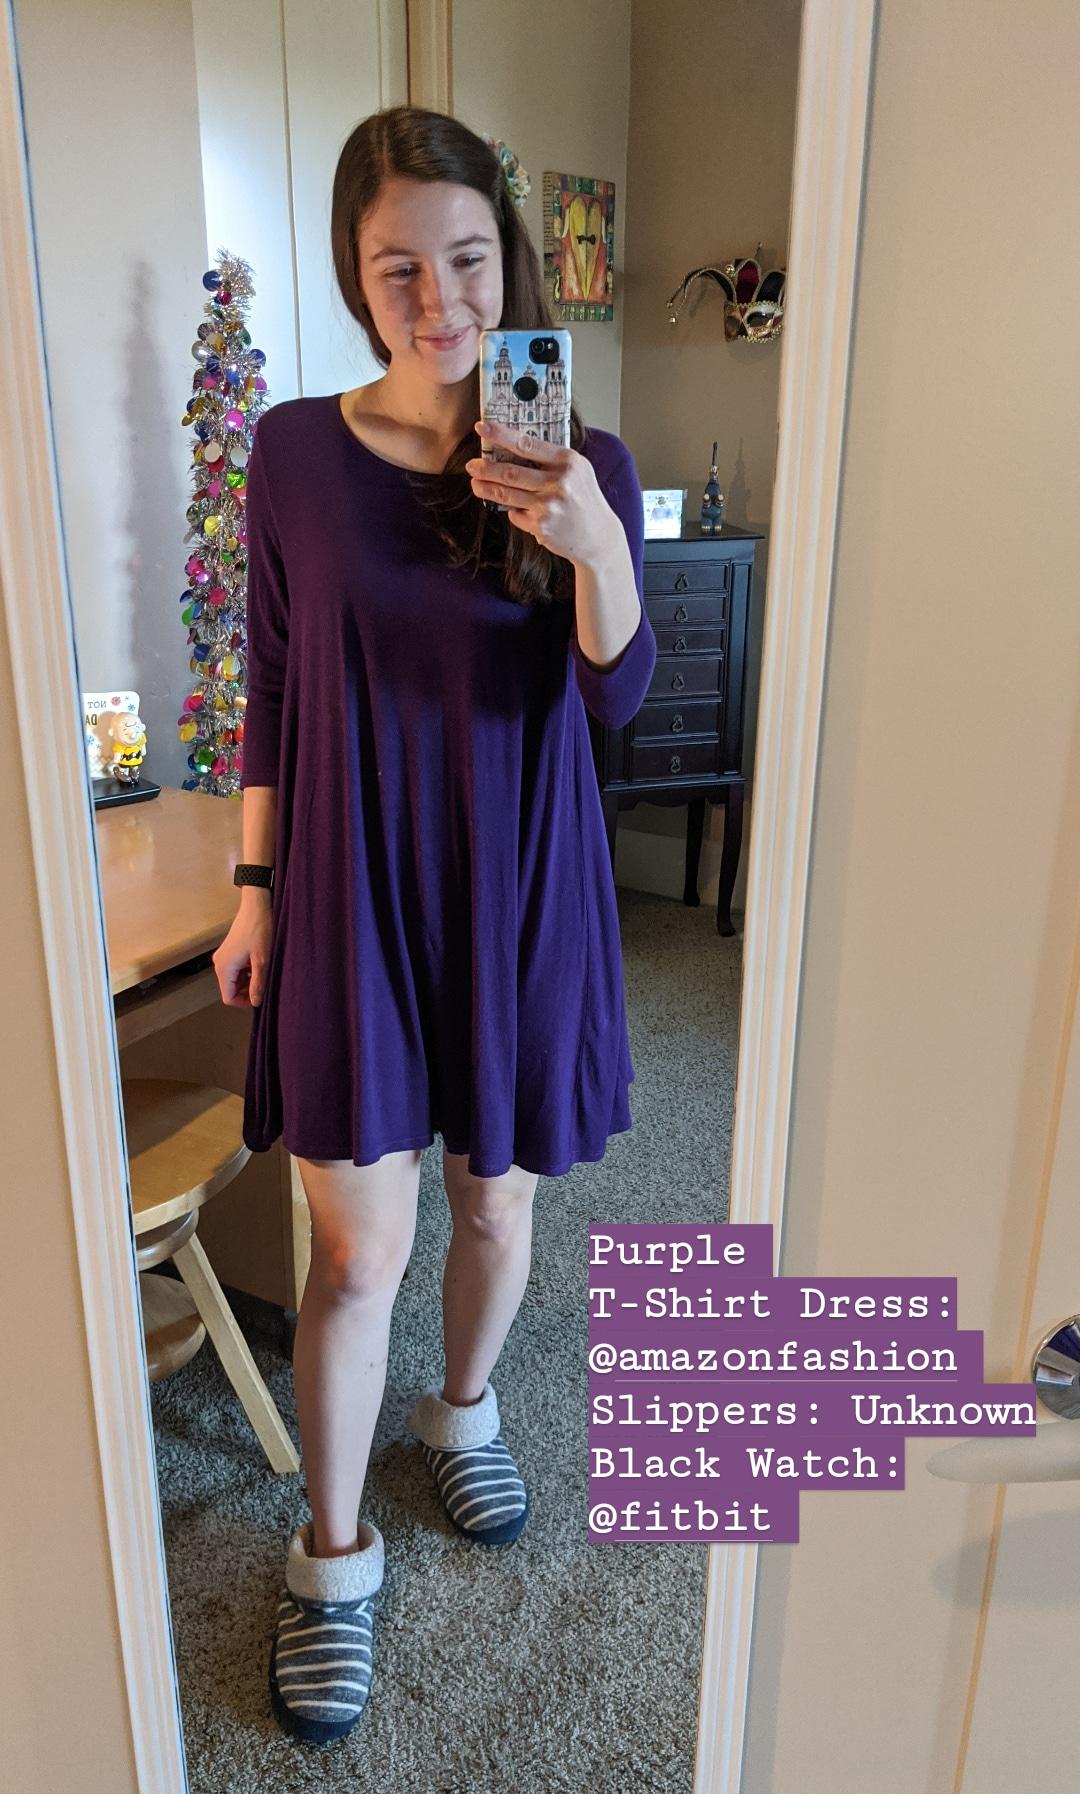 purple t-shirt dress, swing dress, slippers, quarantine outfit